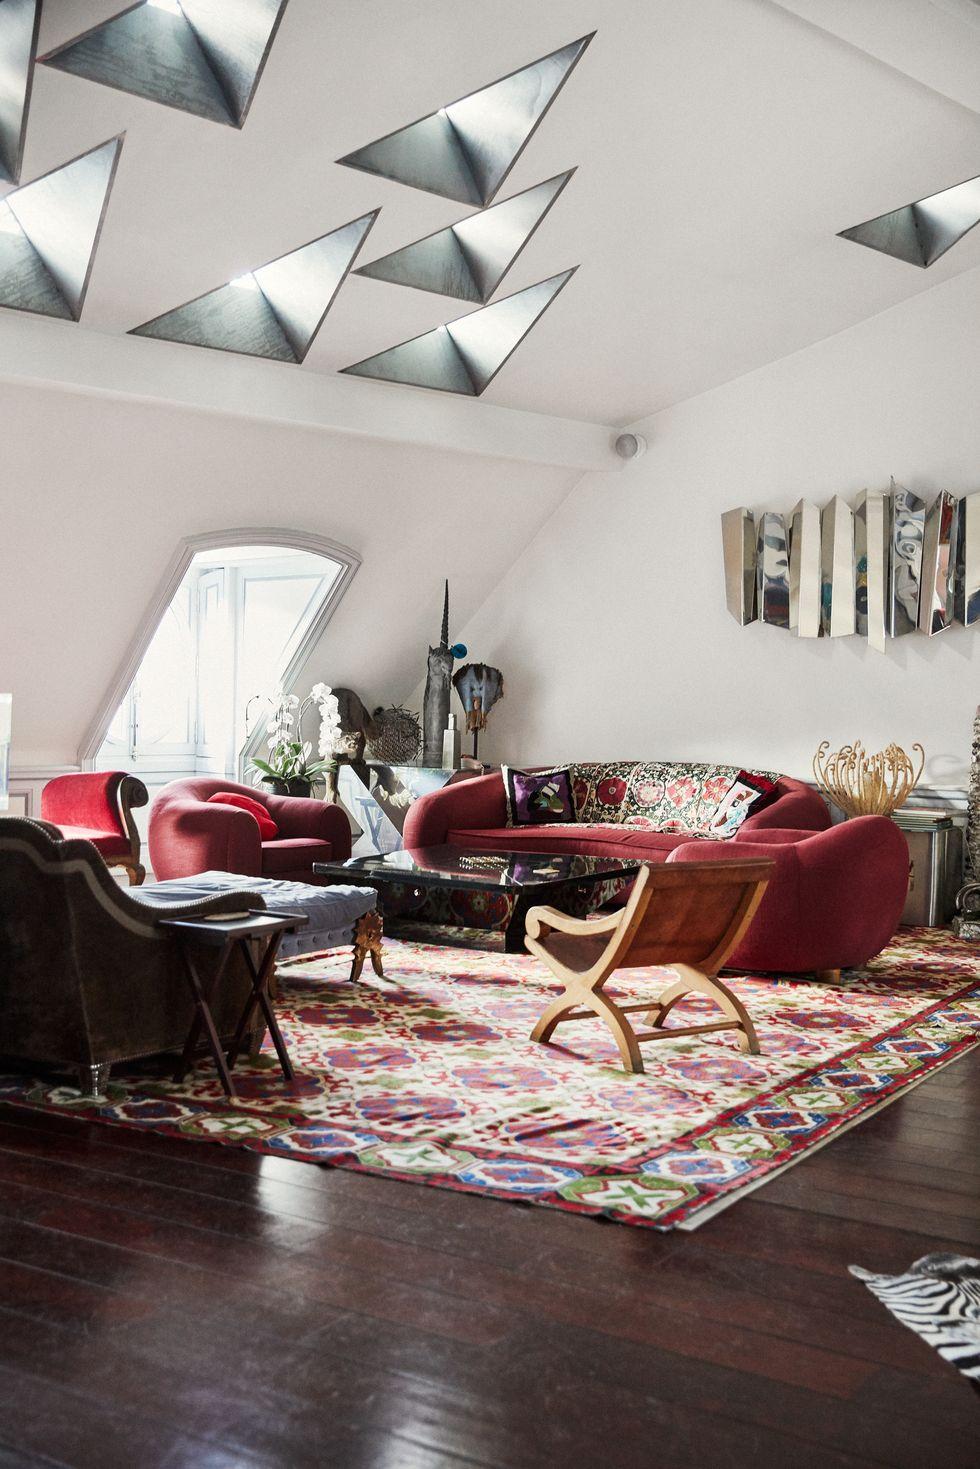 Celebrity Lifestyle Step Inside Christian Louboutin's Parisian Home (2)